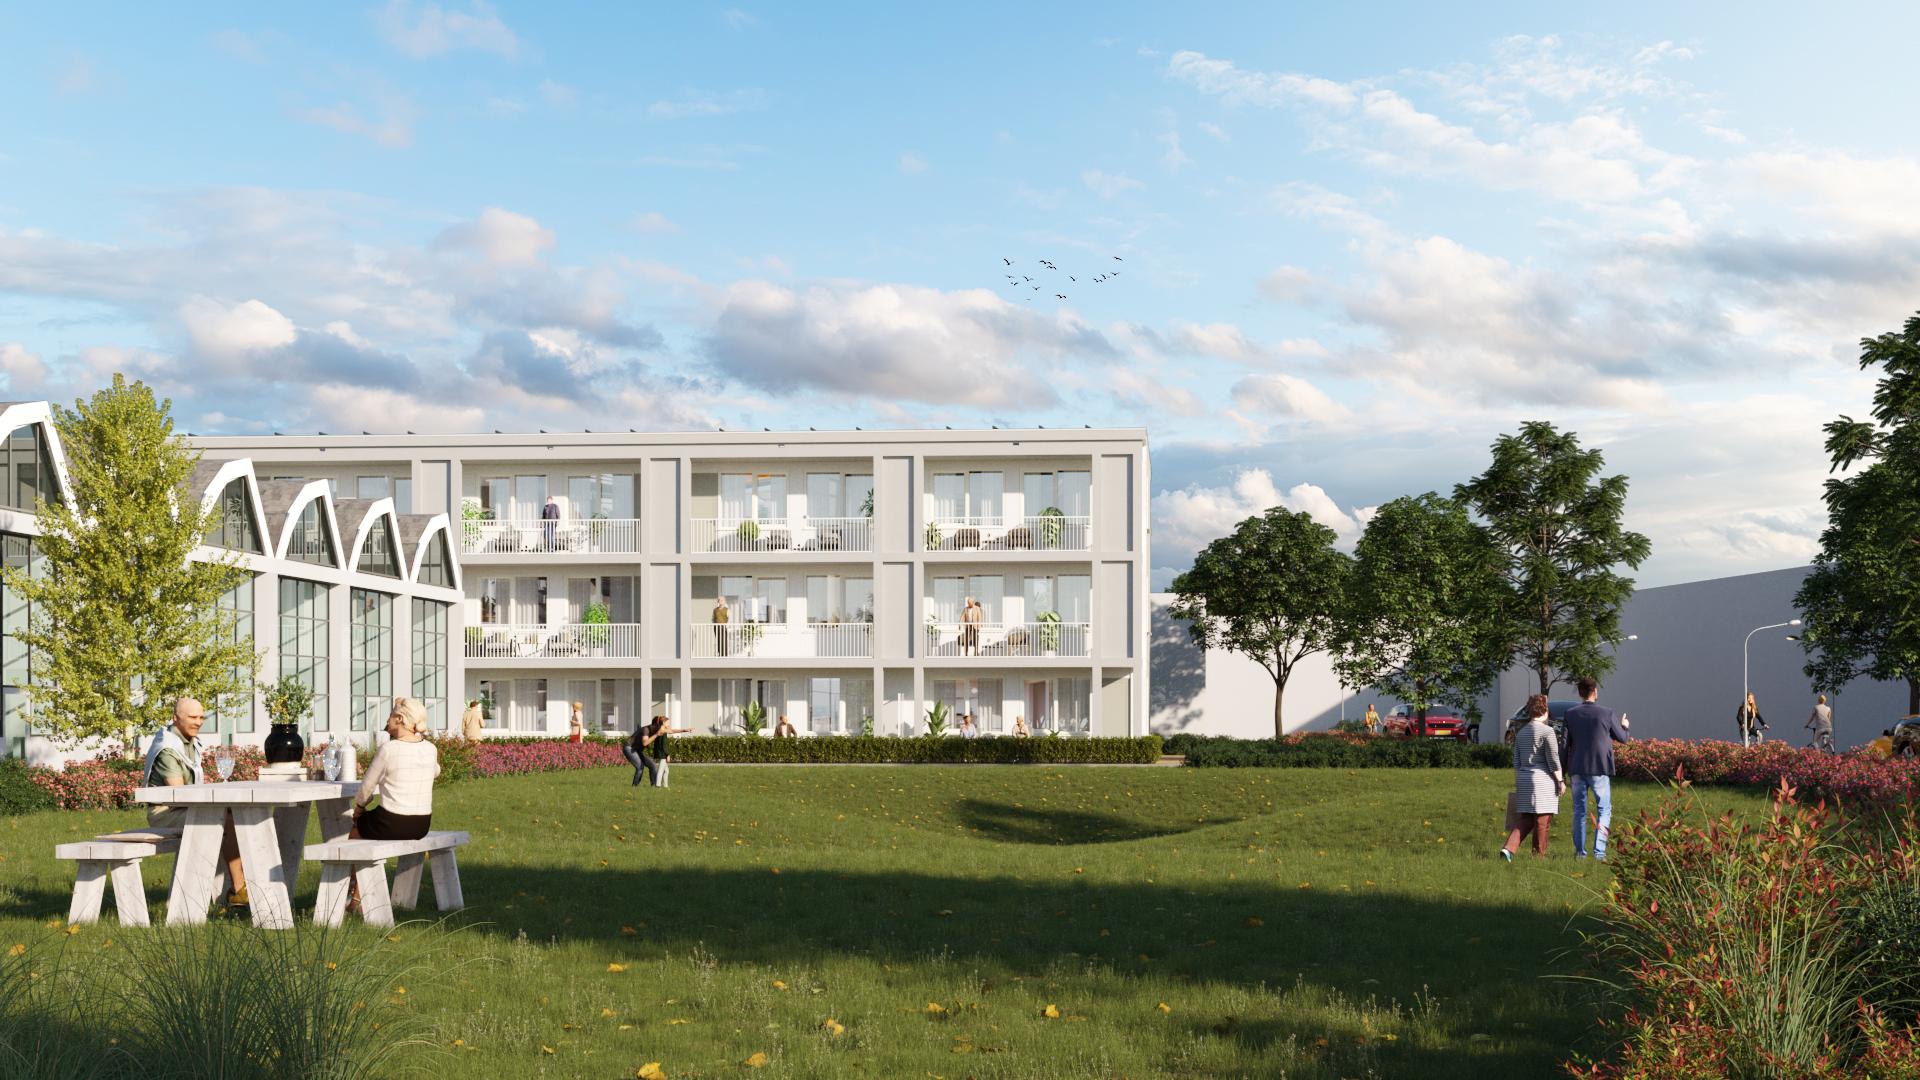 25 nieuwe woonzorgappartementen in Doetinchem